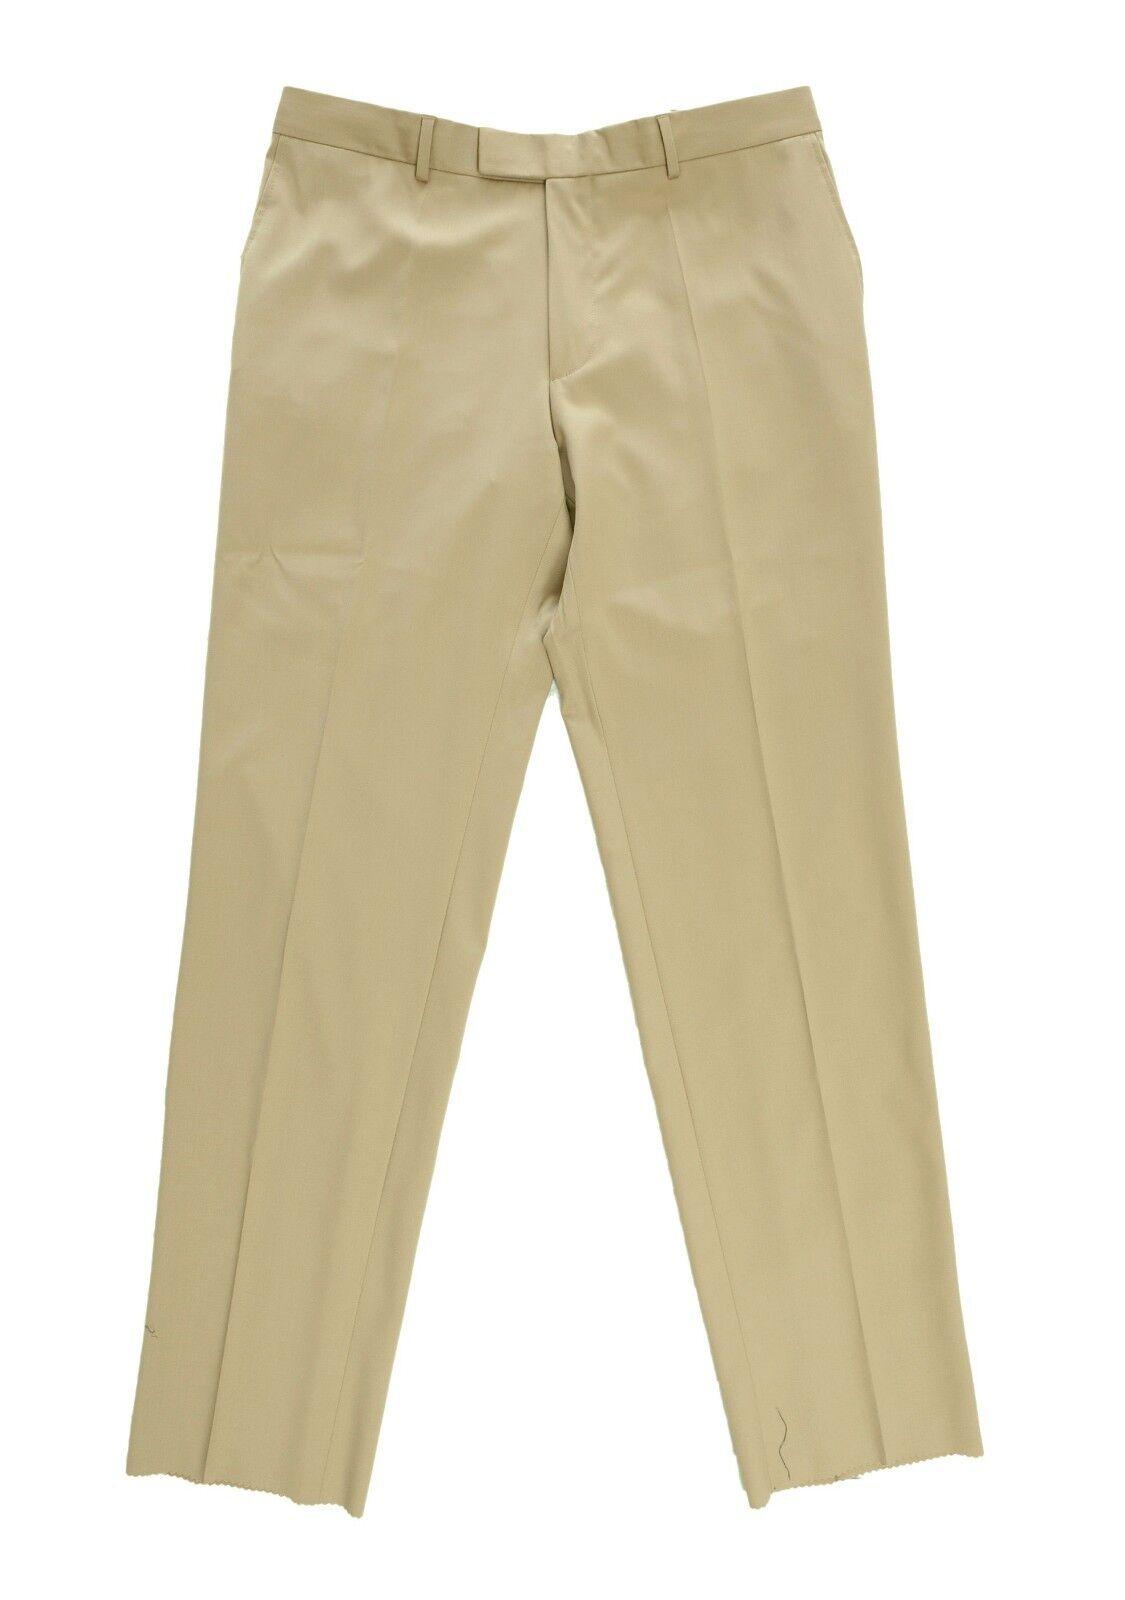 Hugo Boss James Brown US Beige Flat Front Classic Fit Pants 30W Turkey